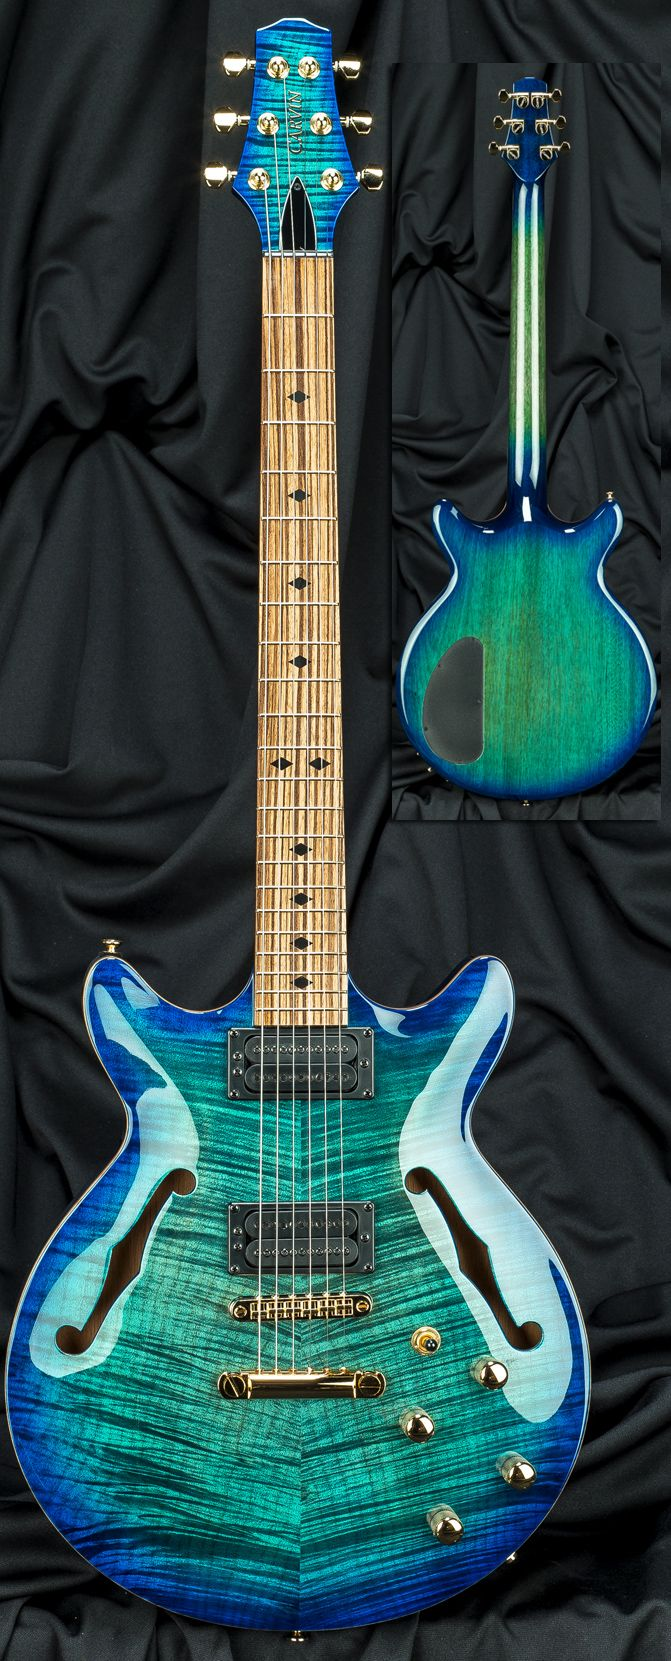 Carvin - www.GuitarHalo.com